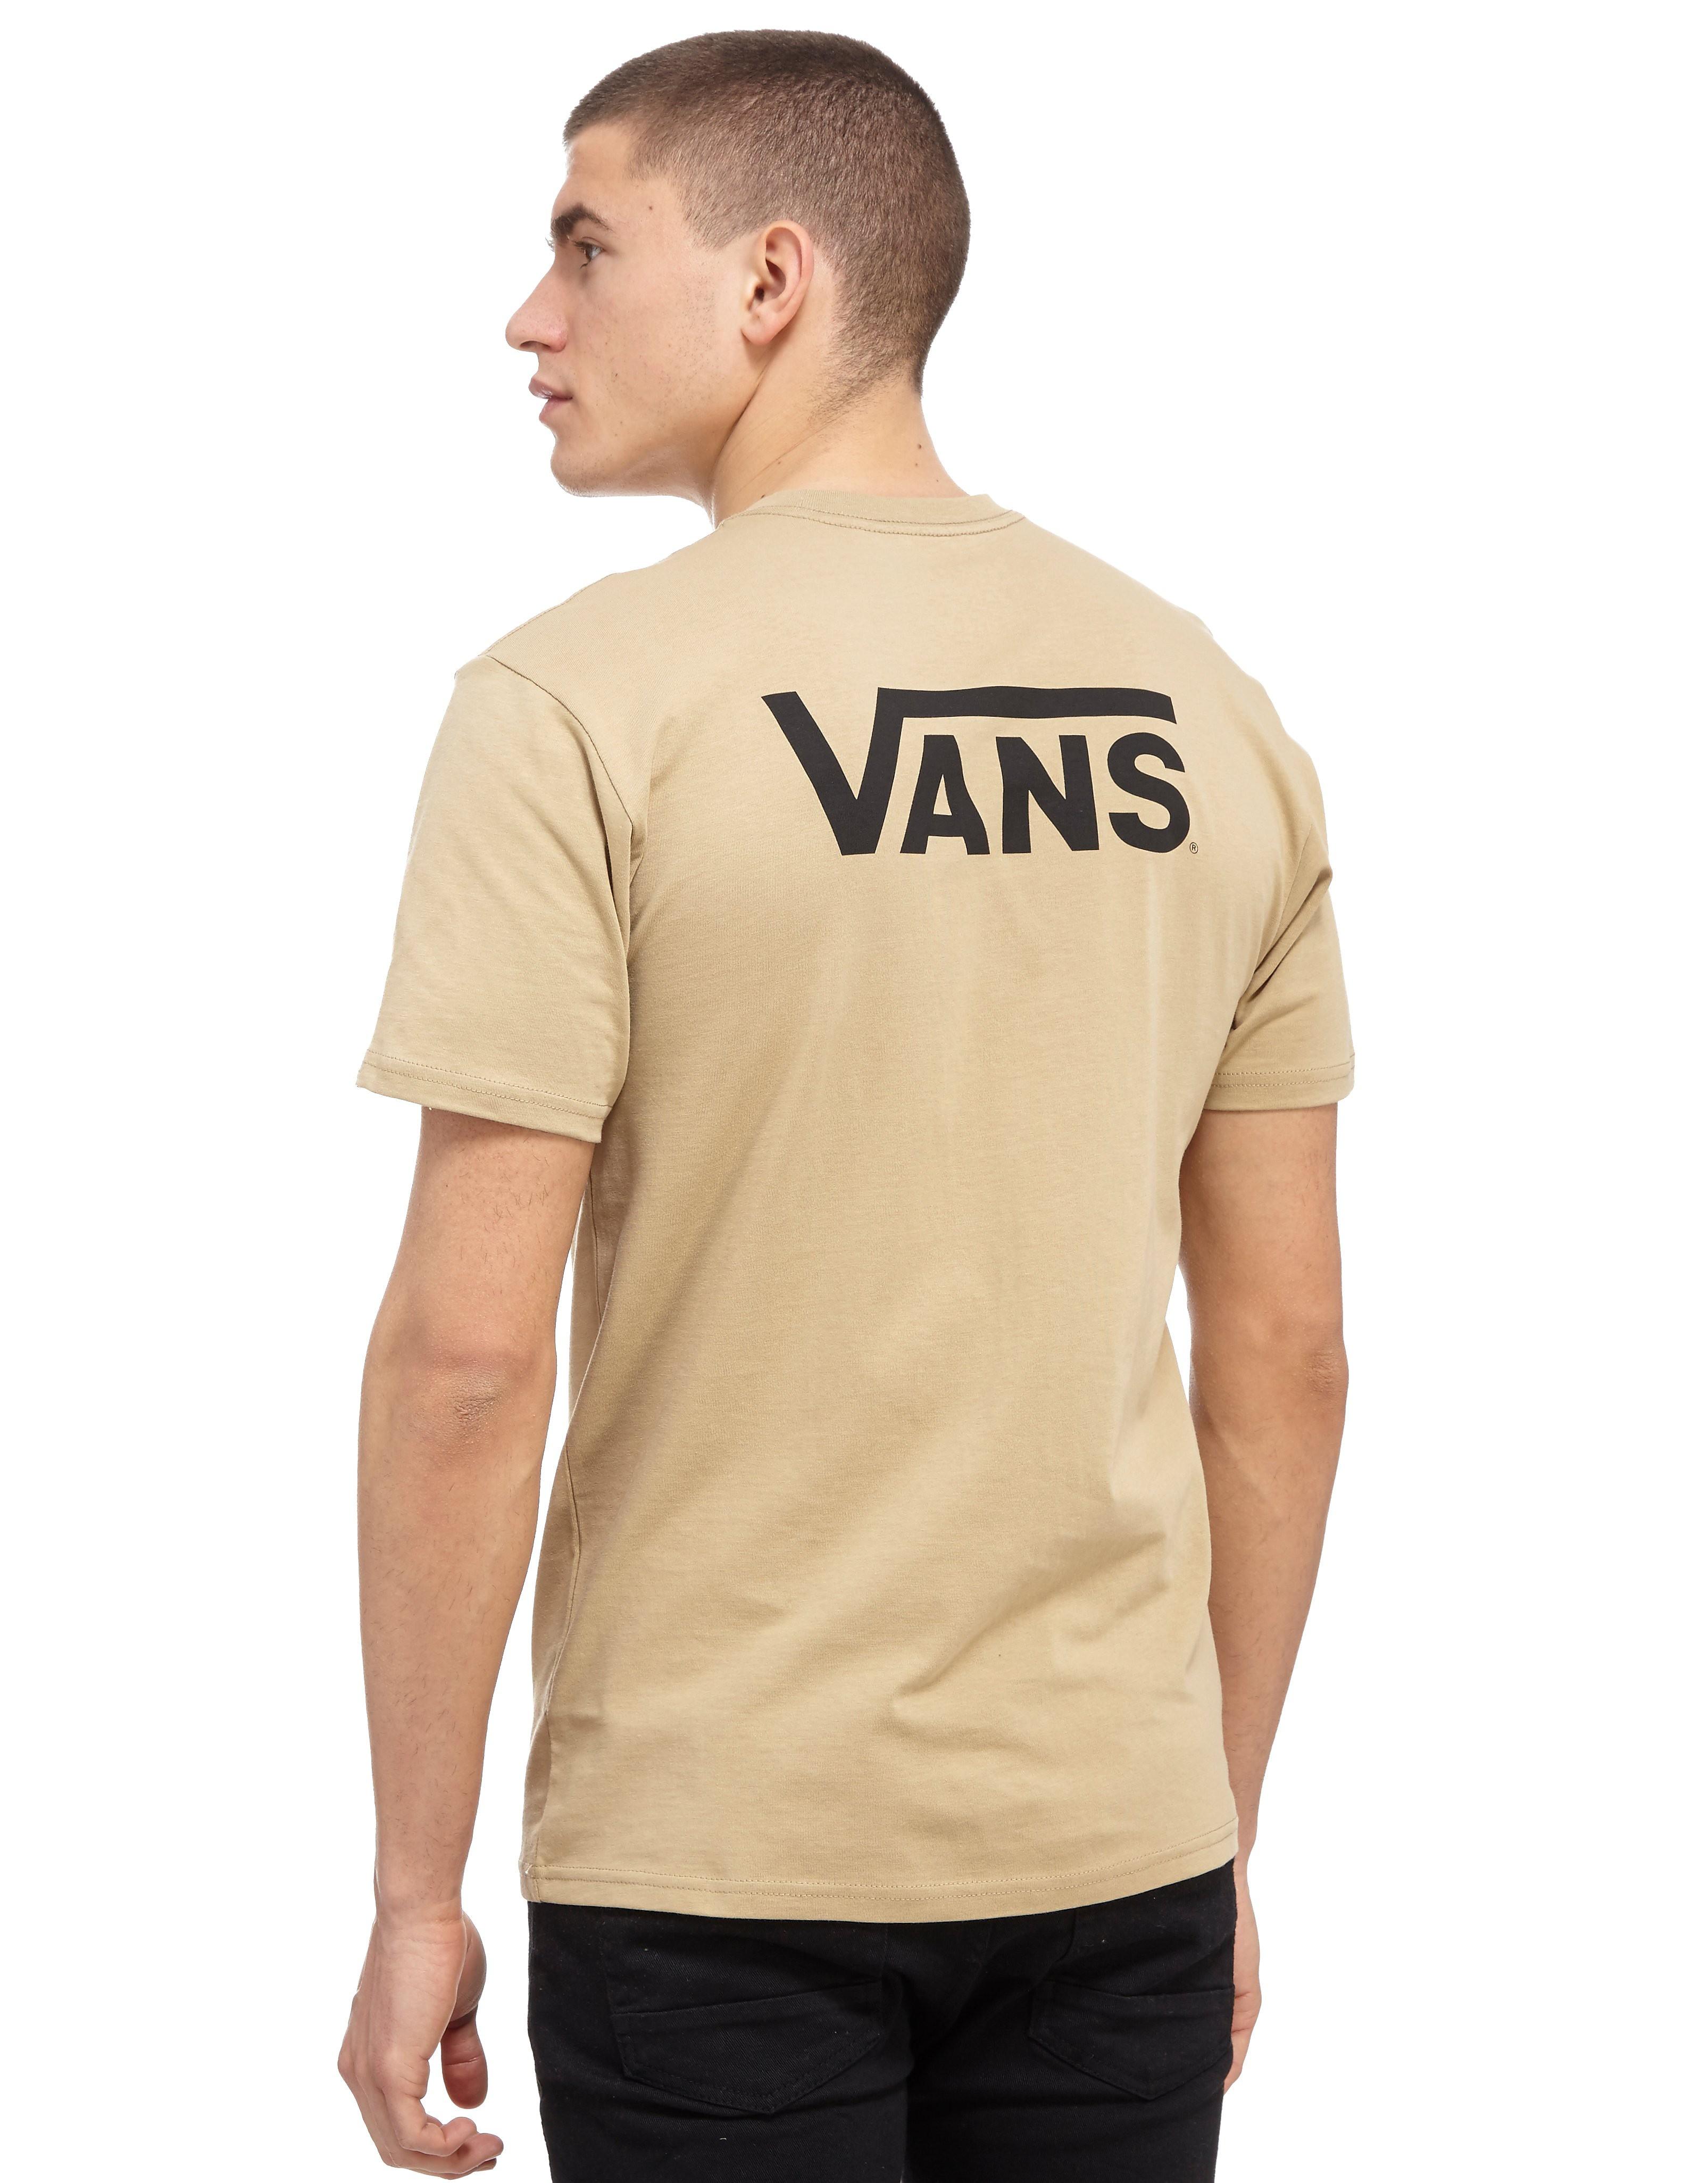 Vans Double Hit T-Shirt